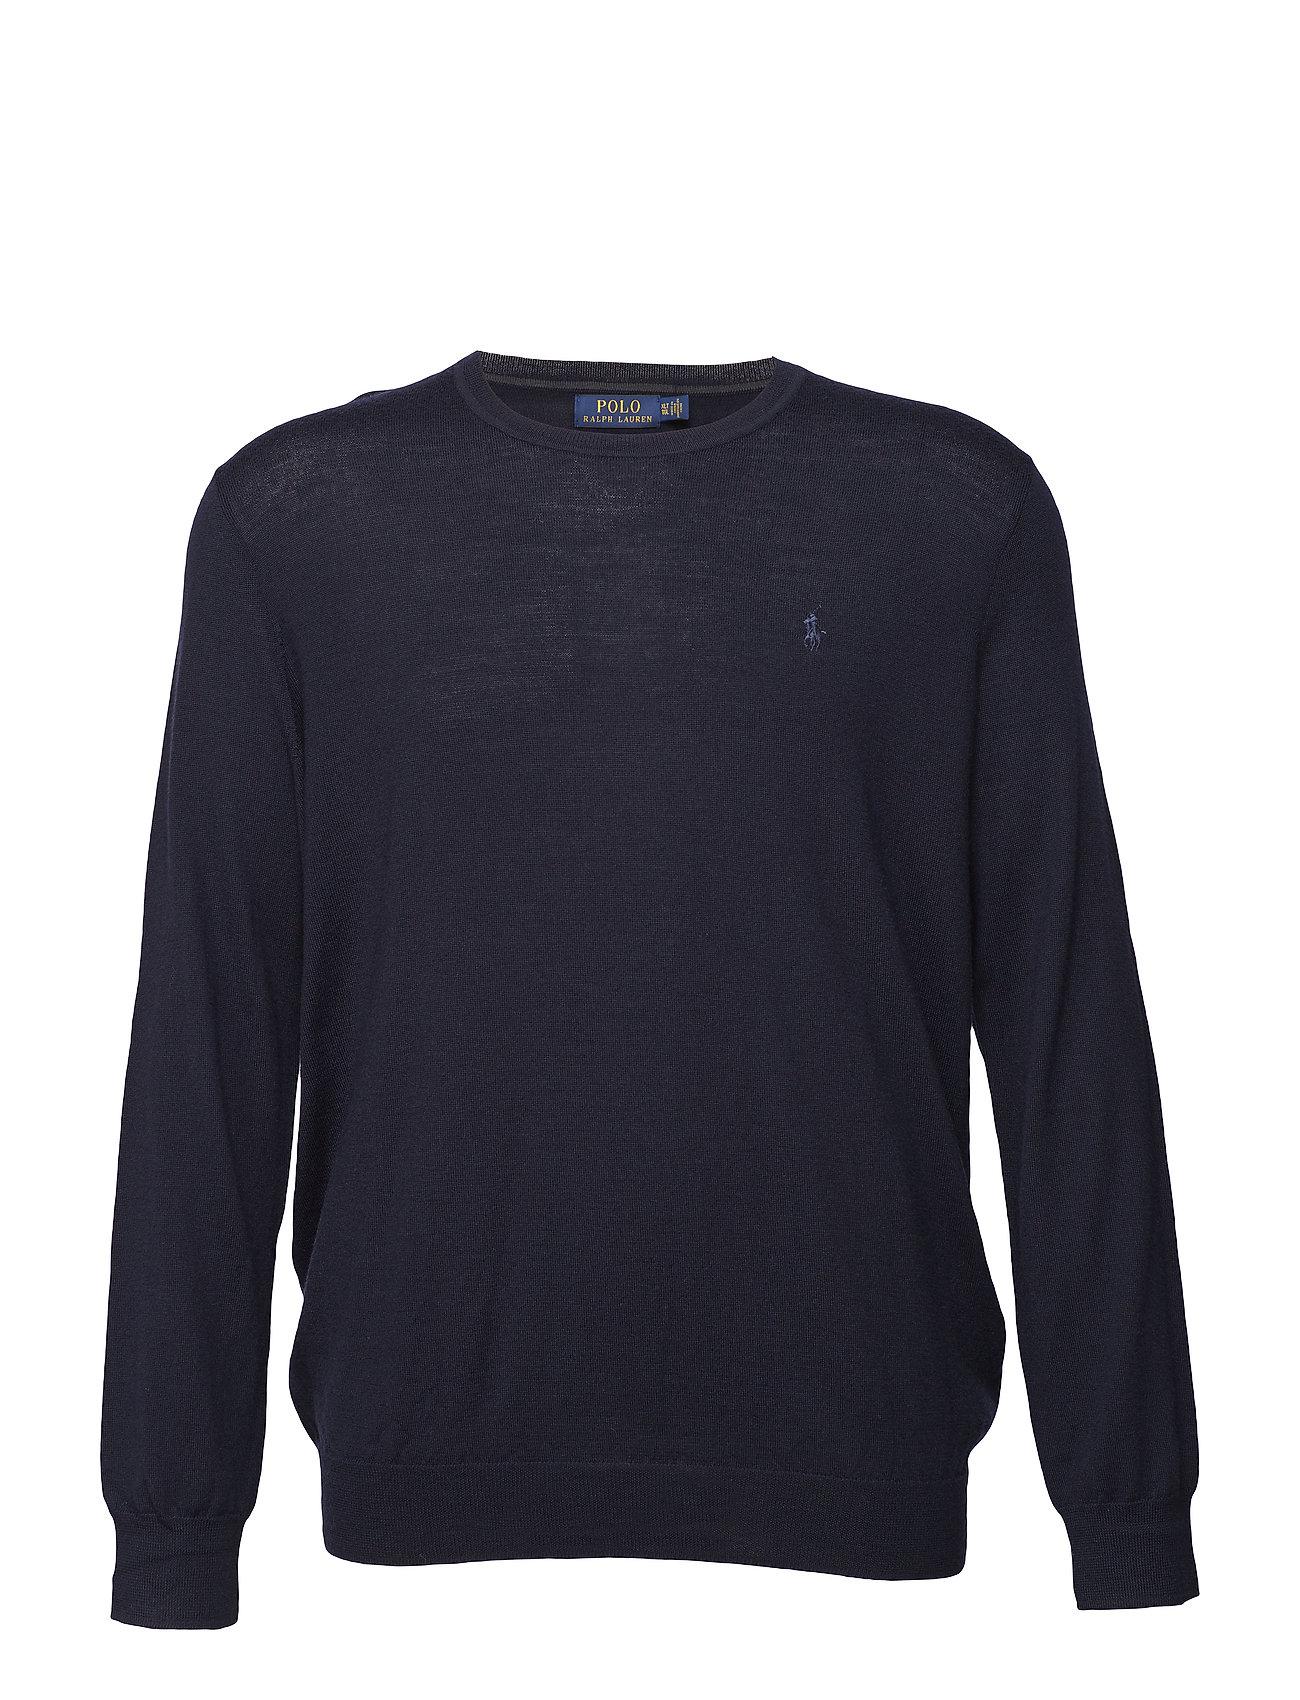 Polo Ralph Lauren Big & Tall Washable Merino Wool Sweater - HUNTER NAVY